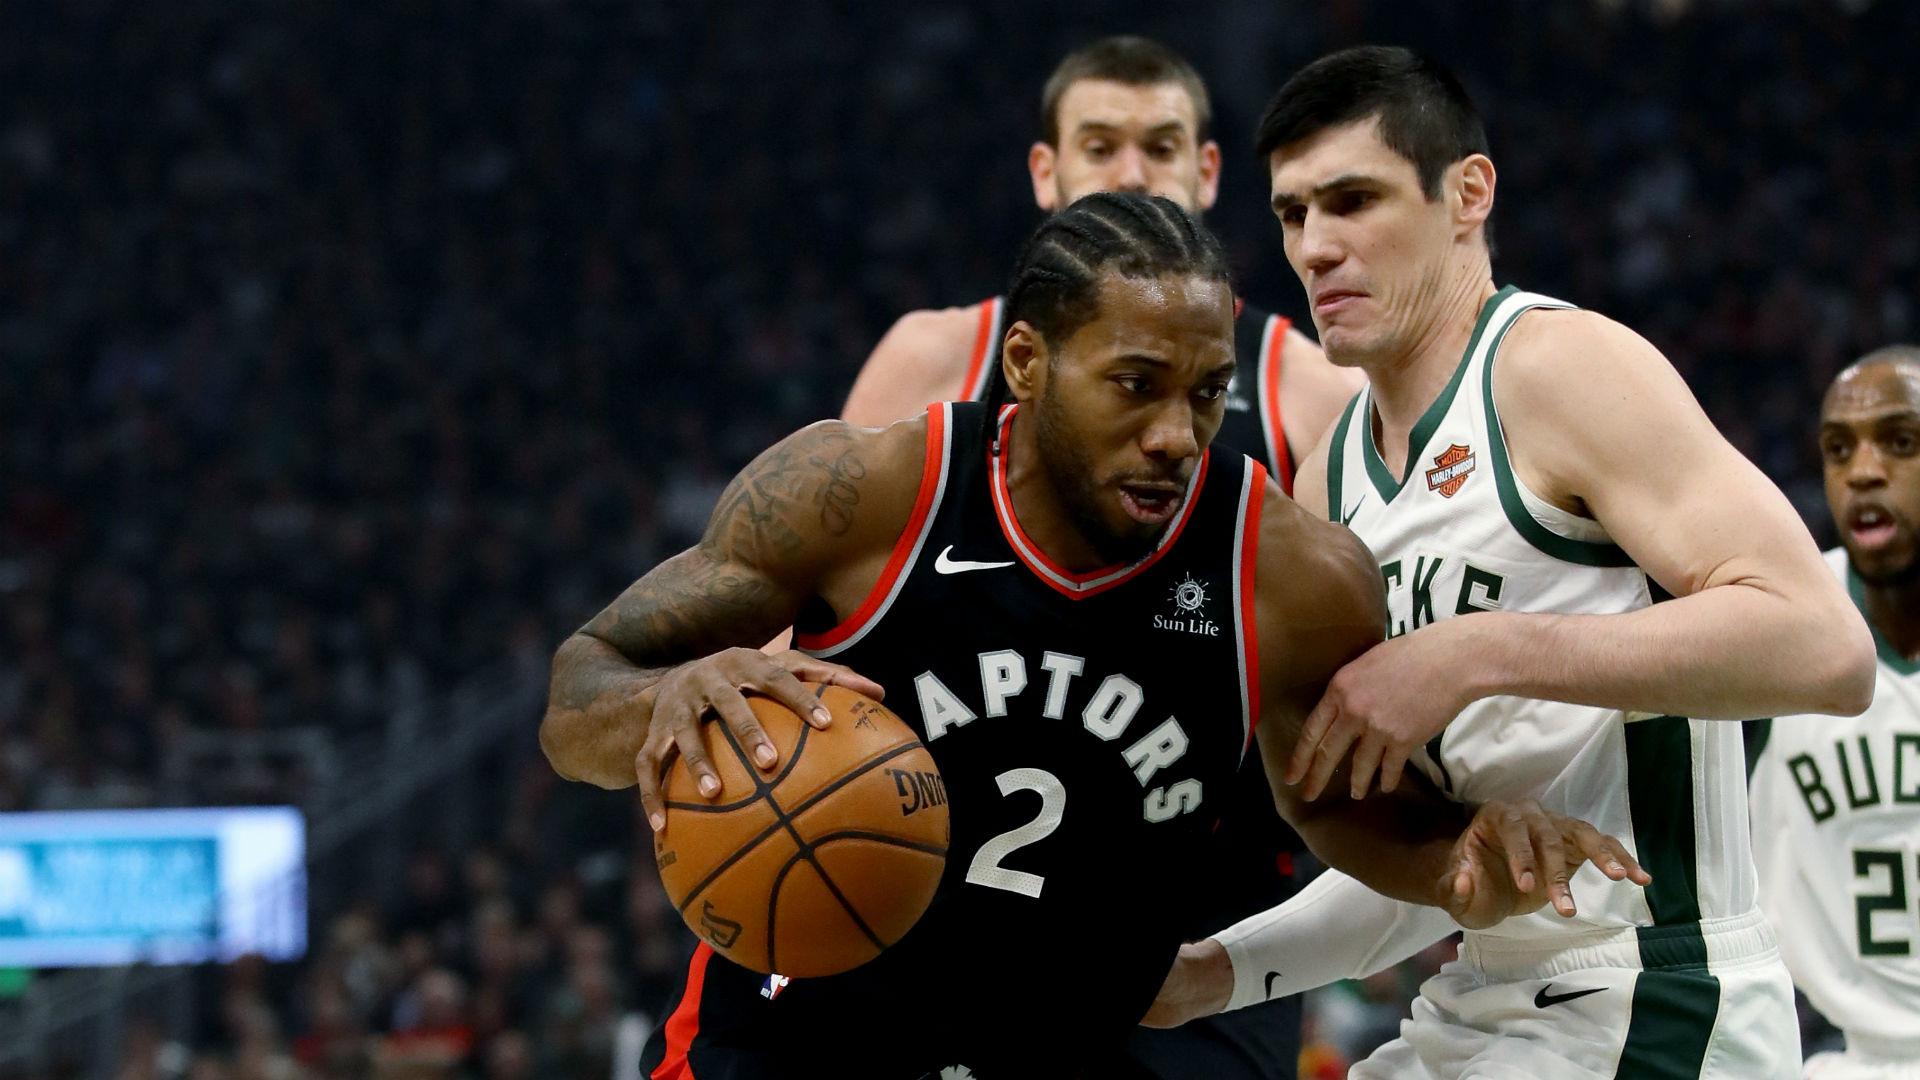 Leonard lays down Raptors challenge after back-to-back Bucks defeats